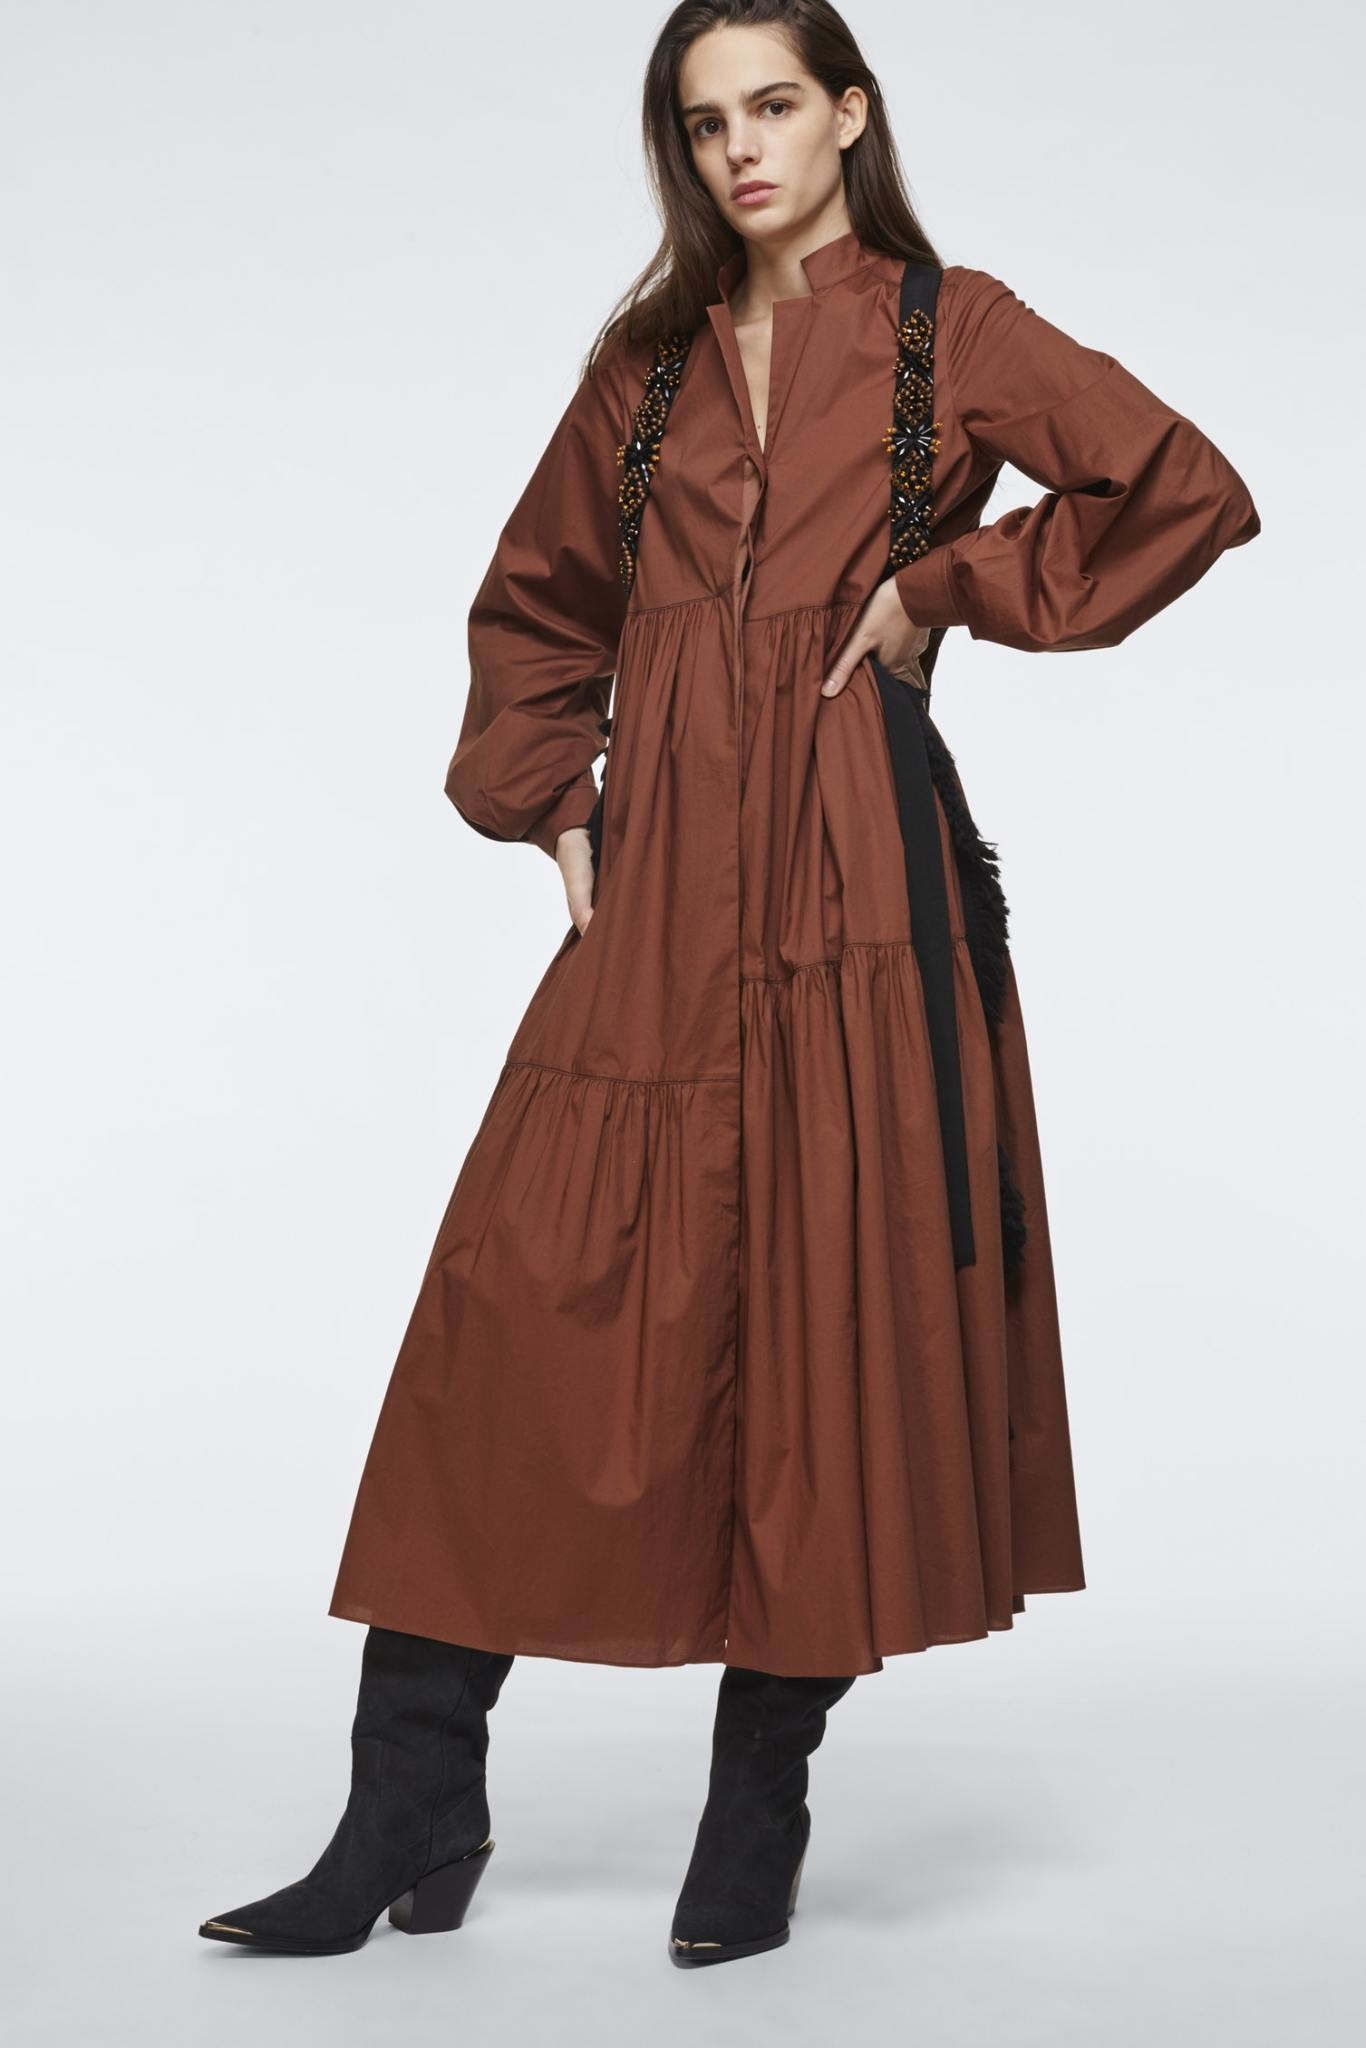 Poplin power dress dorothee schumacher-1